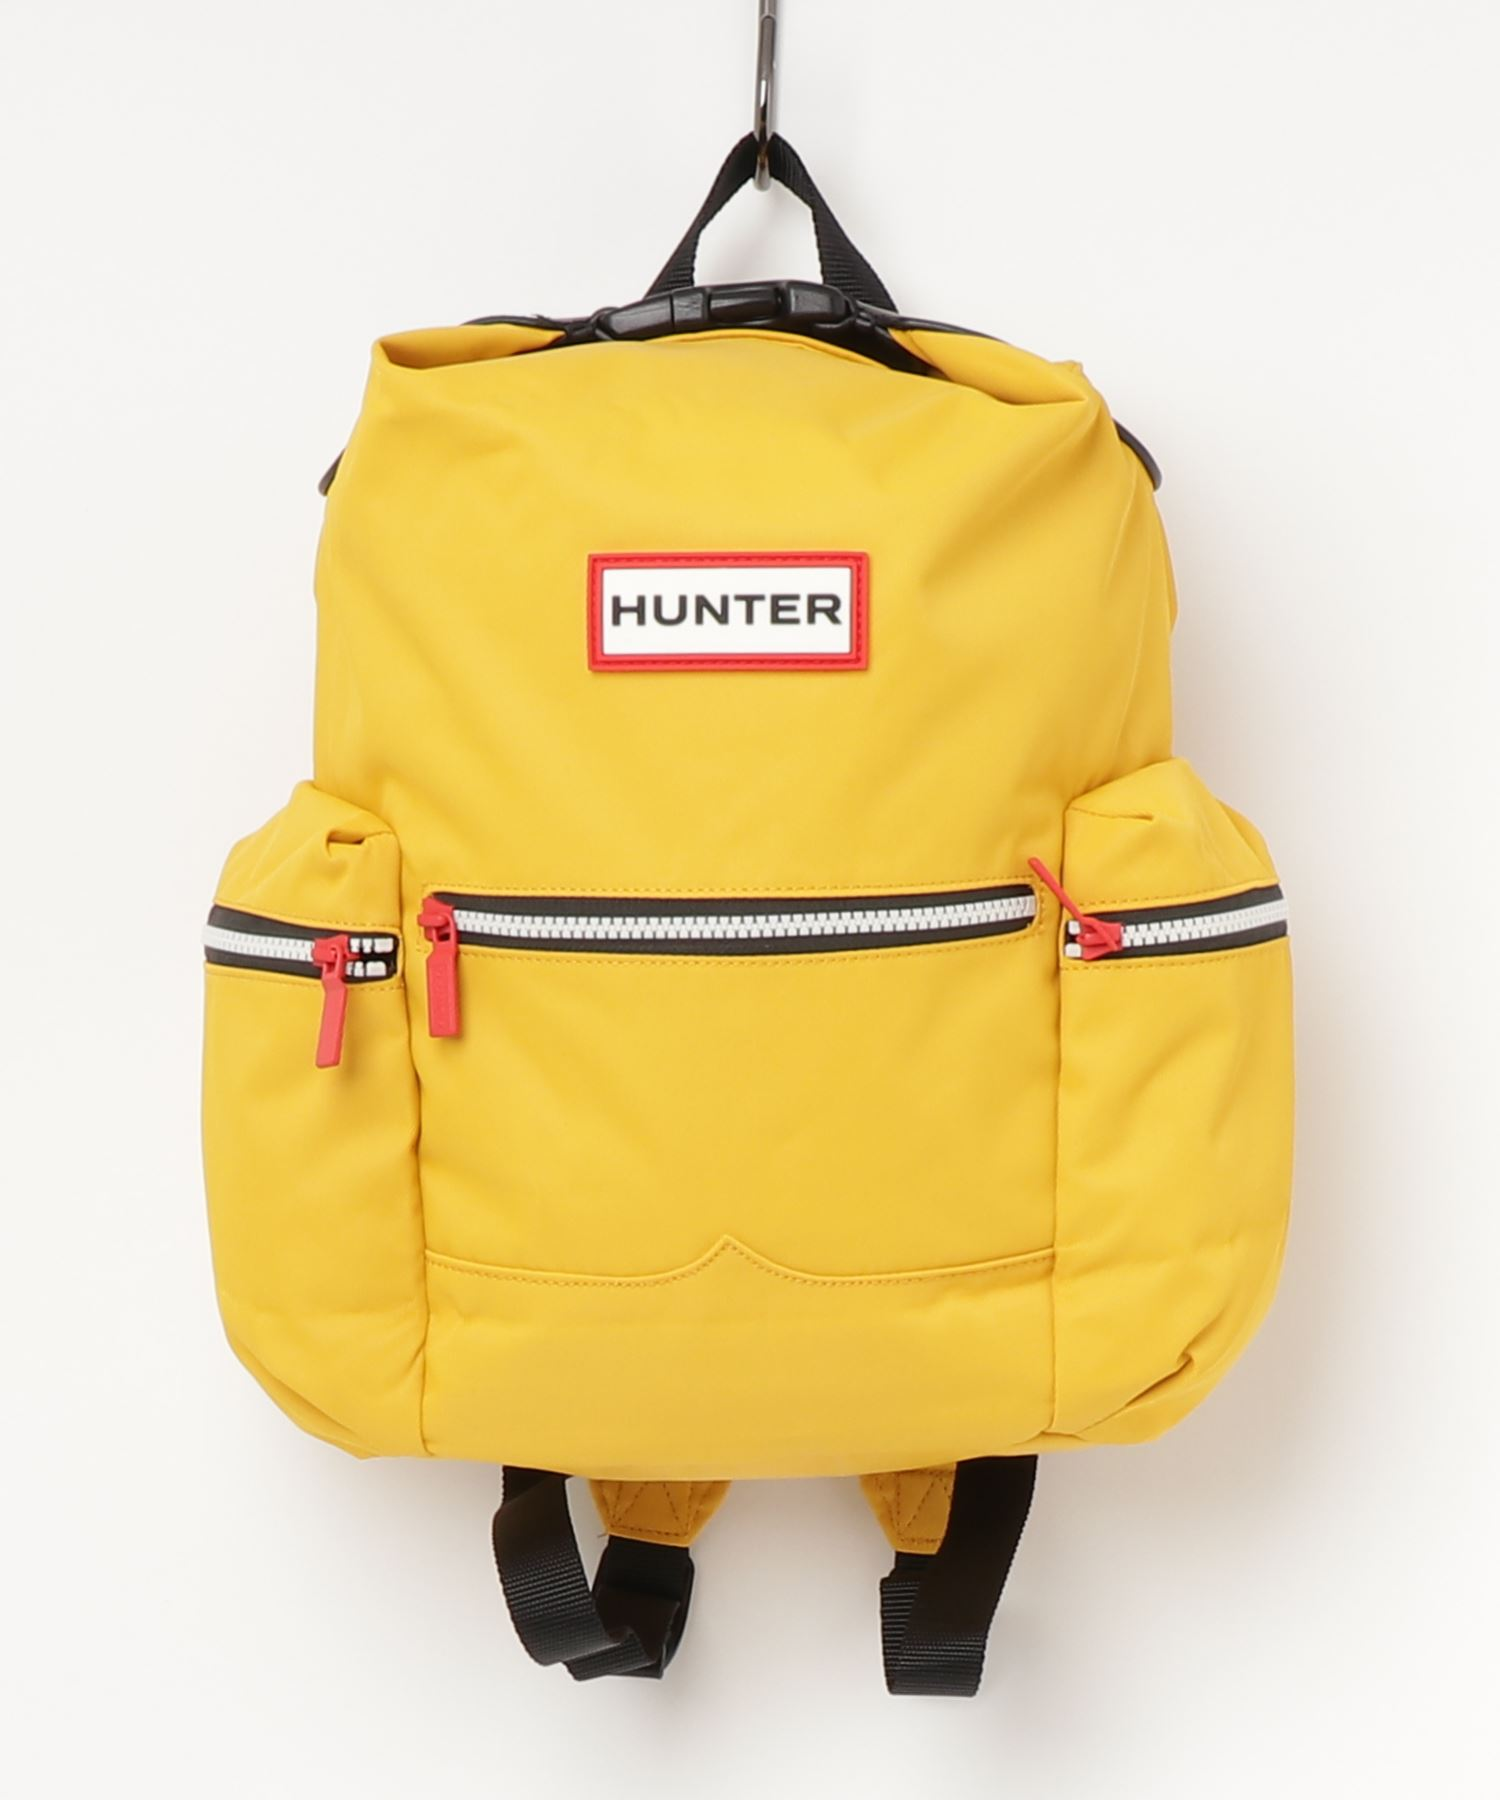 【HUNTER/ハンター】ORIGINAL MINI BACKPACK NYLON UBB6018ACD  HUT オリジナル トップクリップ バックパック/リュック- ナイロン